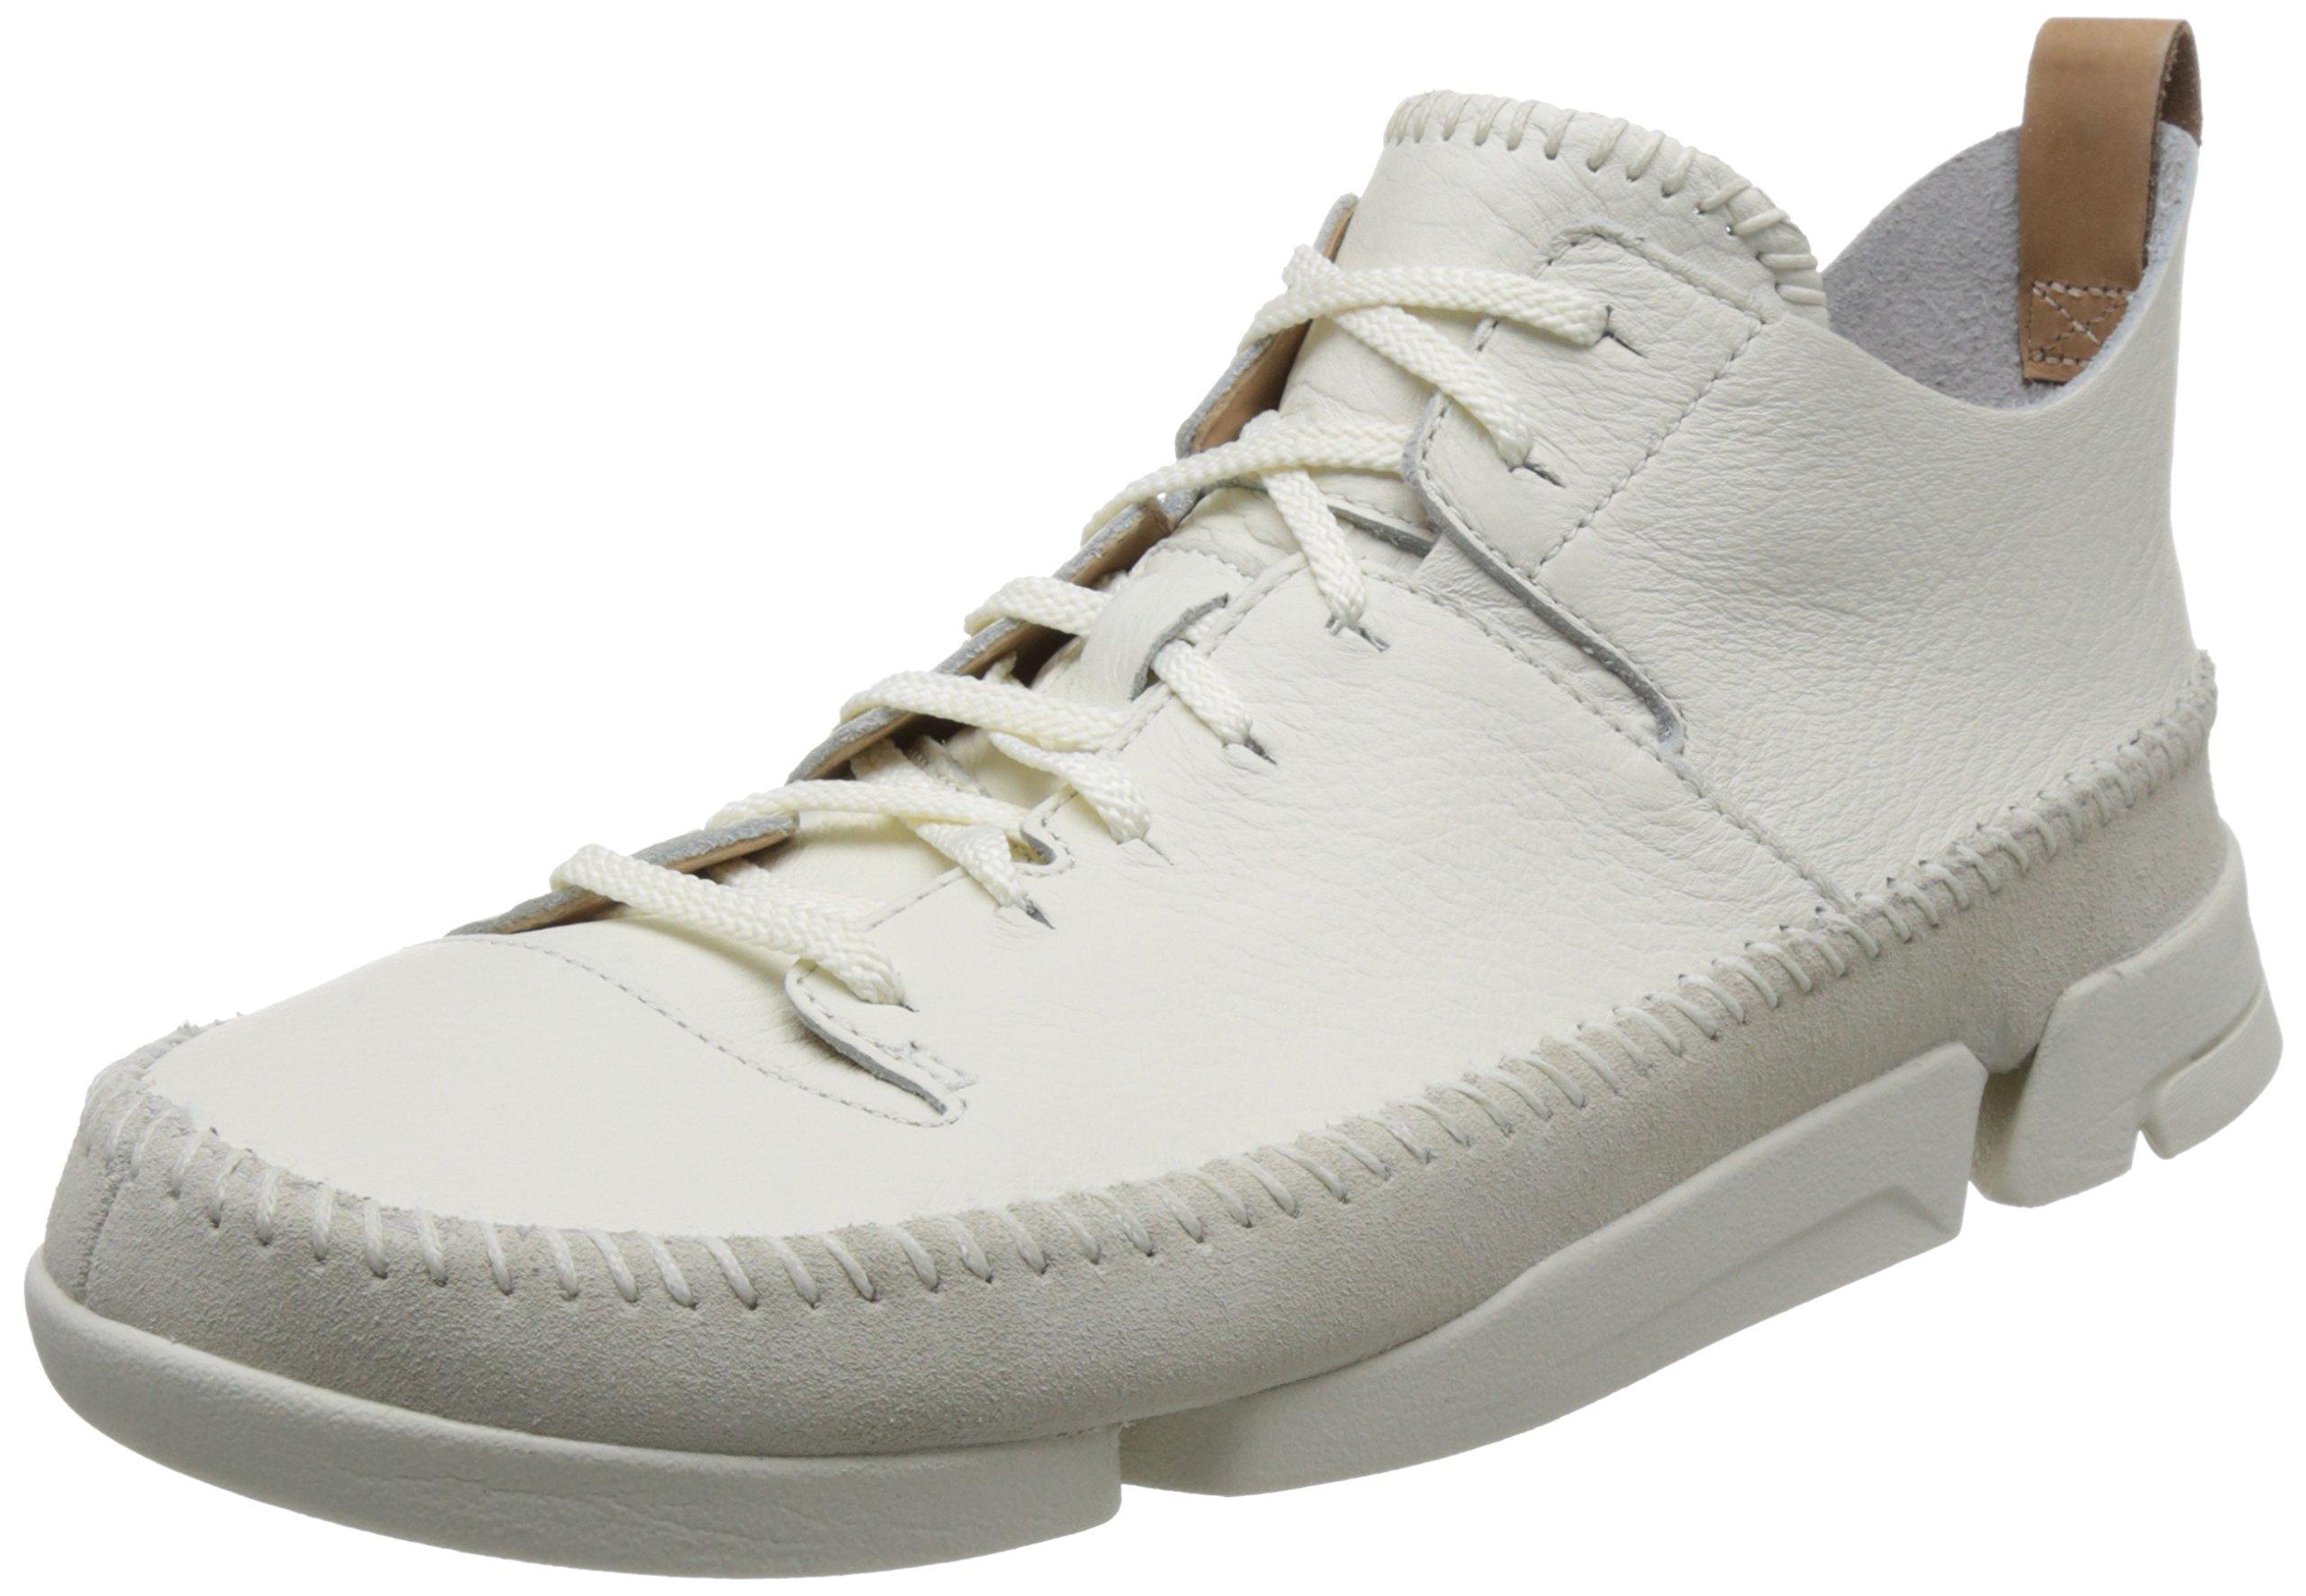 Clarks 男 Trigenic FlexOriginals系列 Trigenic Flex 生活休闲鞋 26117915